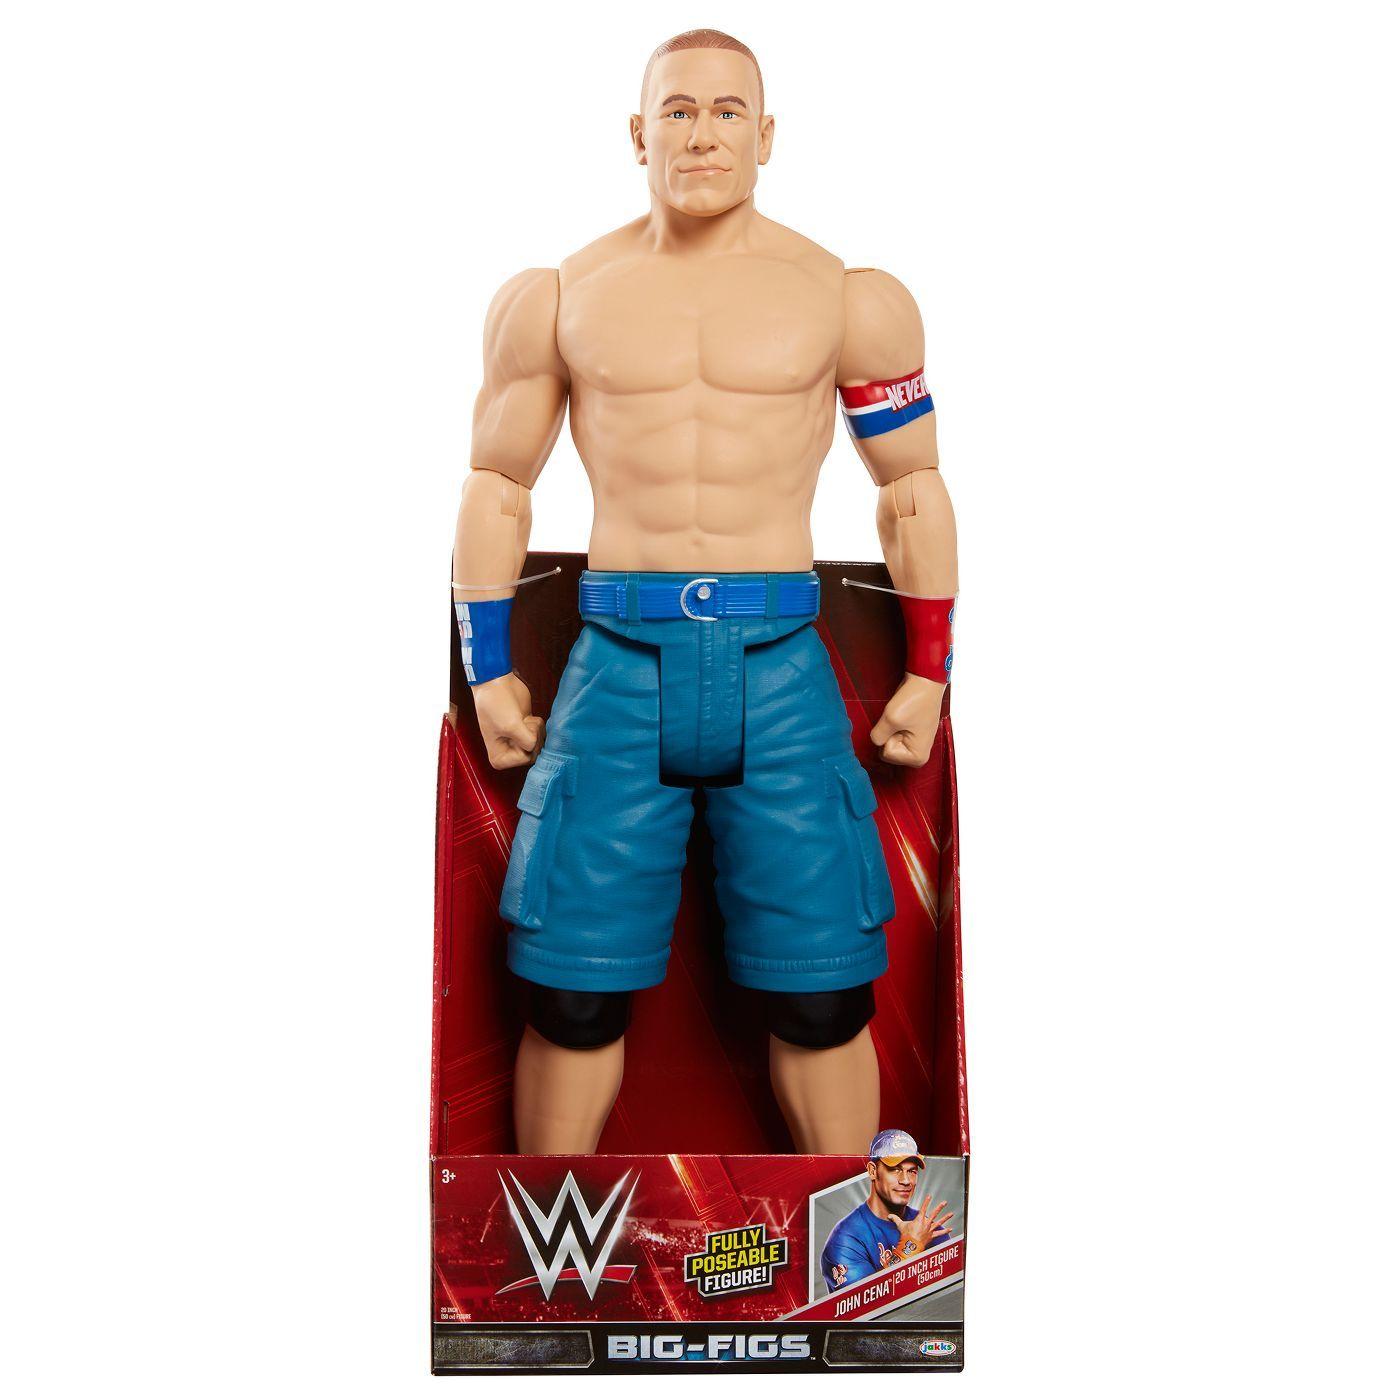 Wwe 20 Big Figs John Cena Action Figure Adib075h9m9vm John Cena John Cena Action Figure John Cena Toys